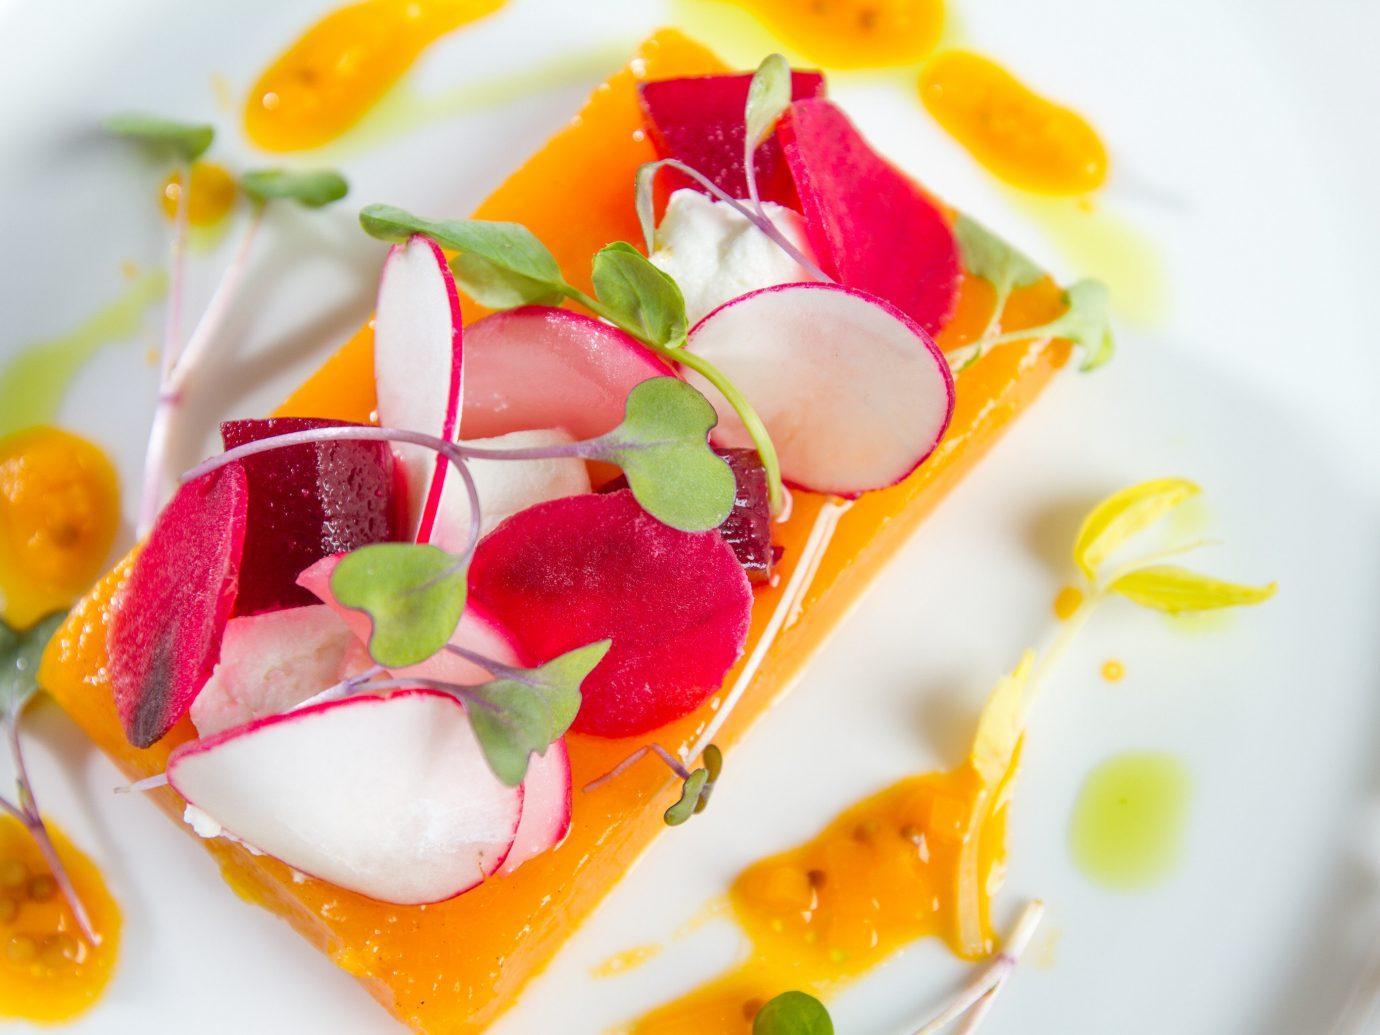 Jetsetter Guides plate food dish plant produce fruit petal flower dessert land plant cuisine flowering plant sweetness slice sauce flavor containing arranged